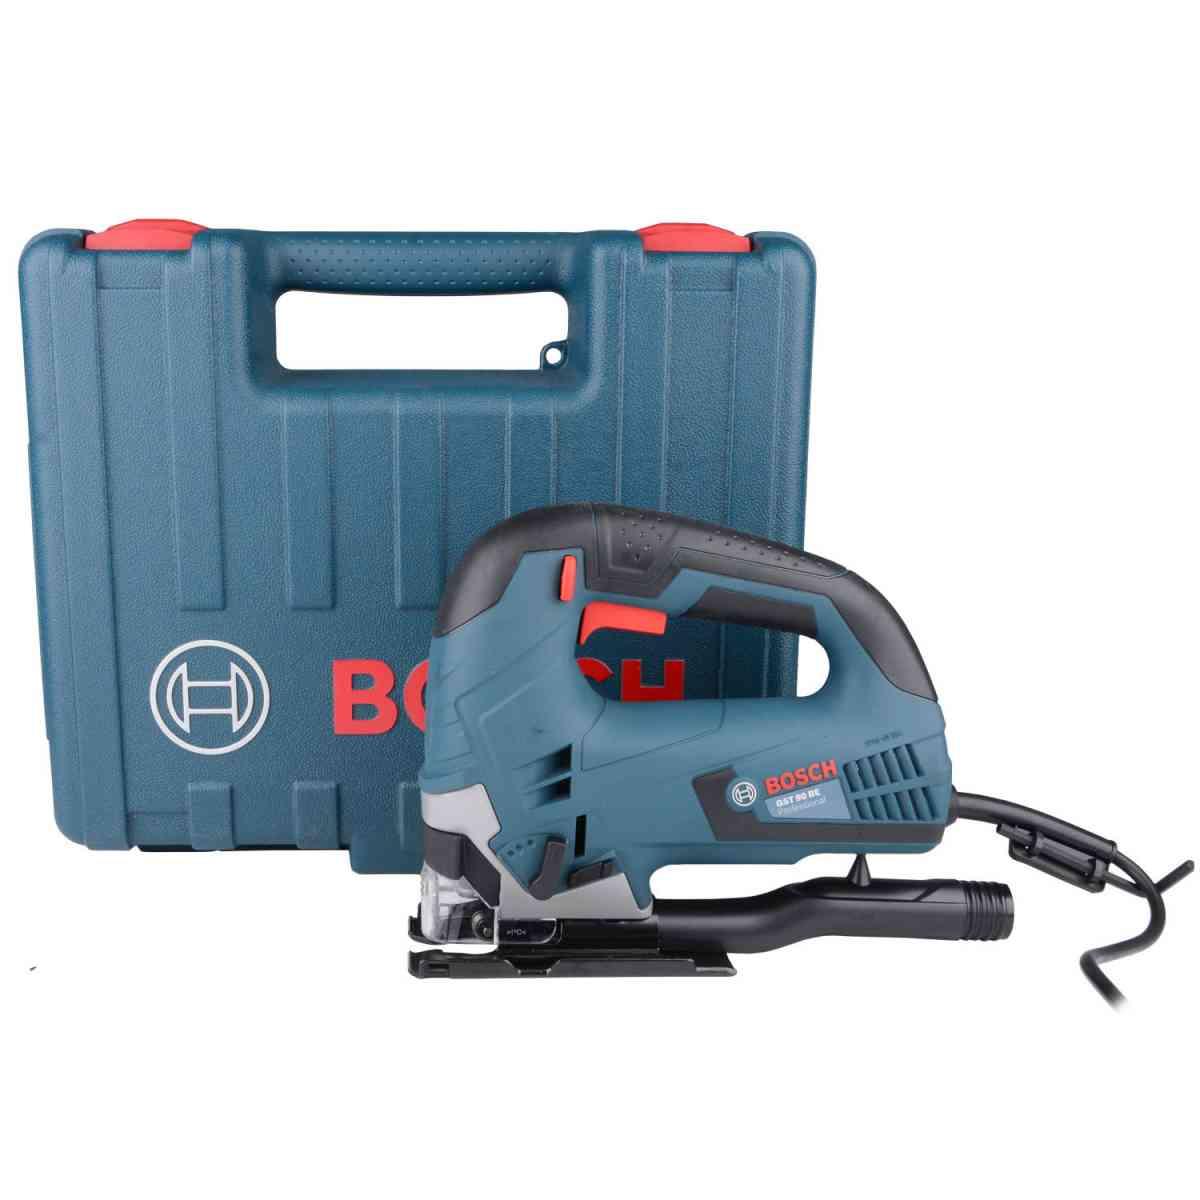 Serra Tico-Tico 650W GST90BE Bosch - 220 Volts